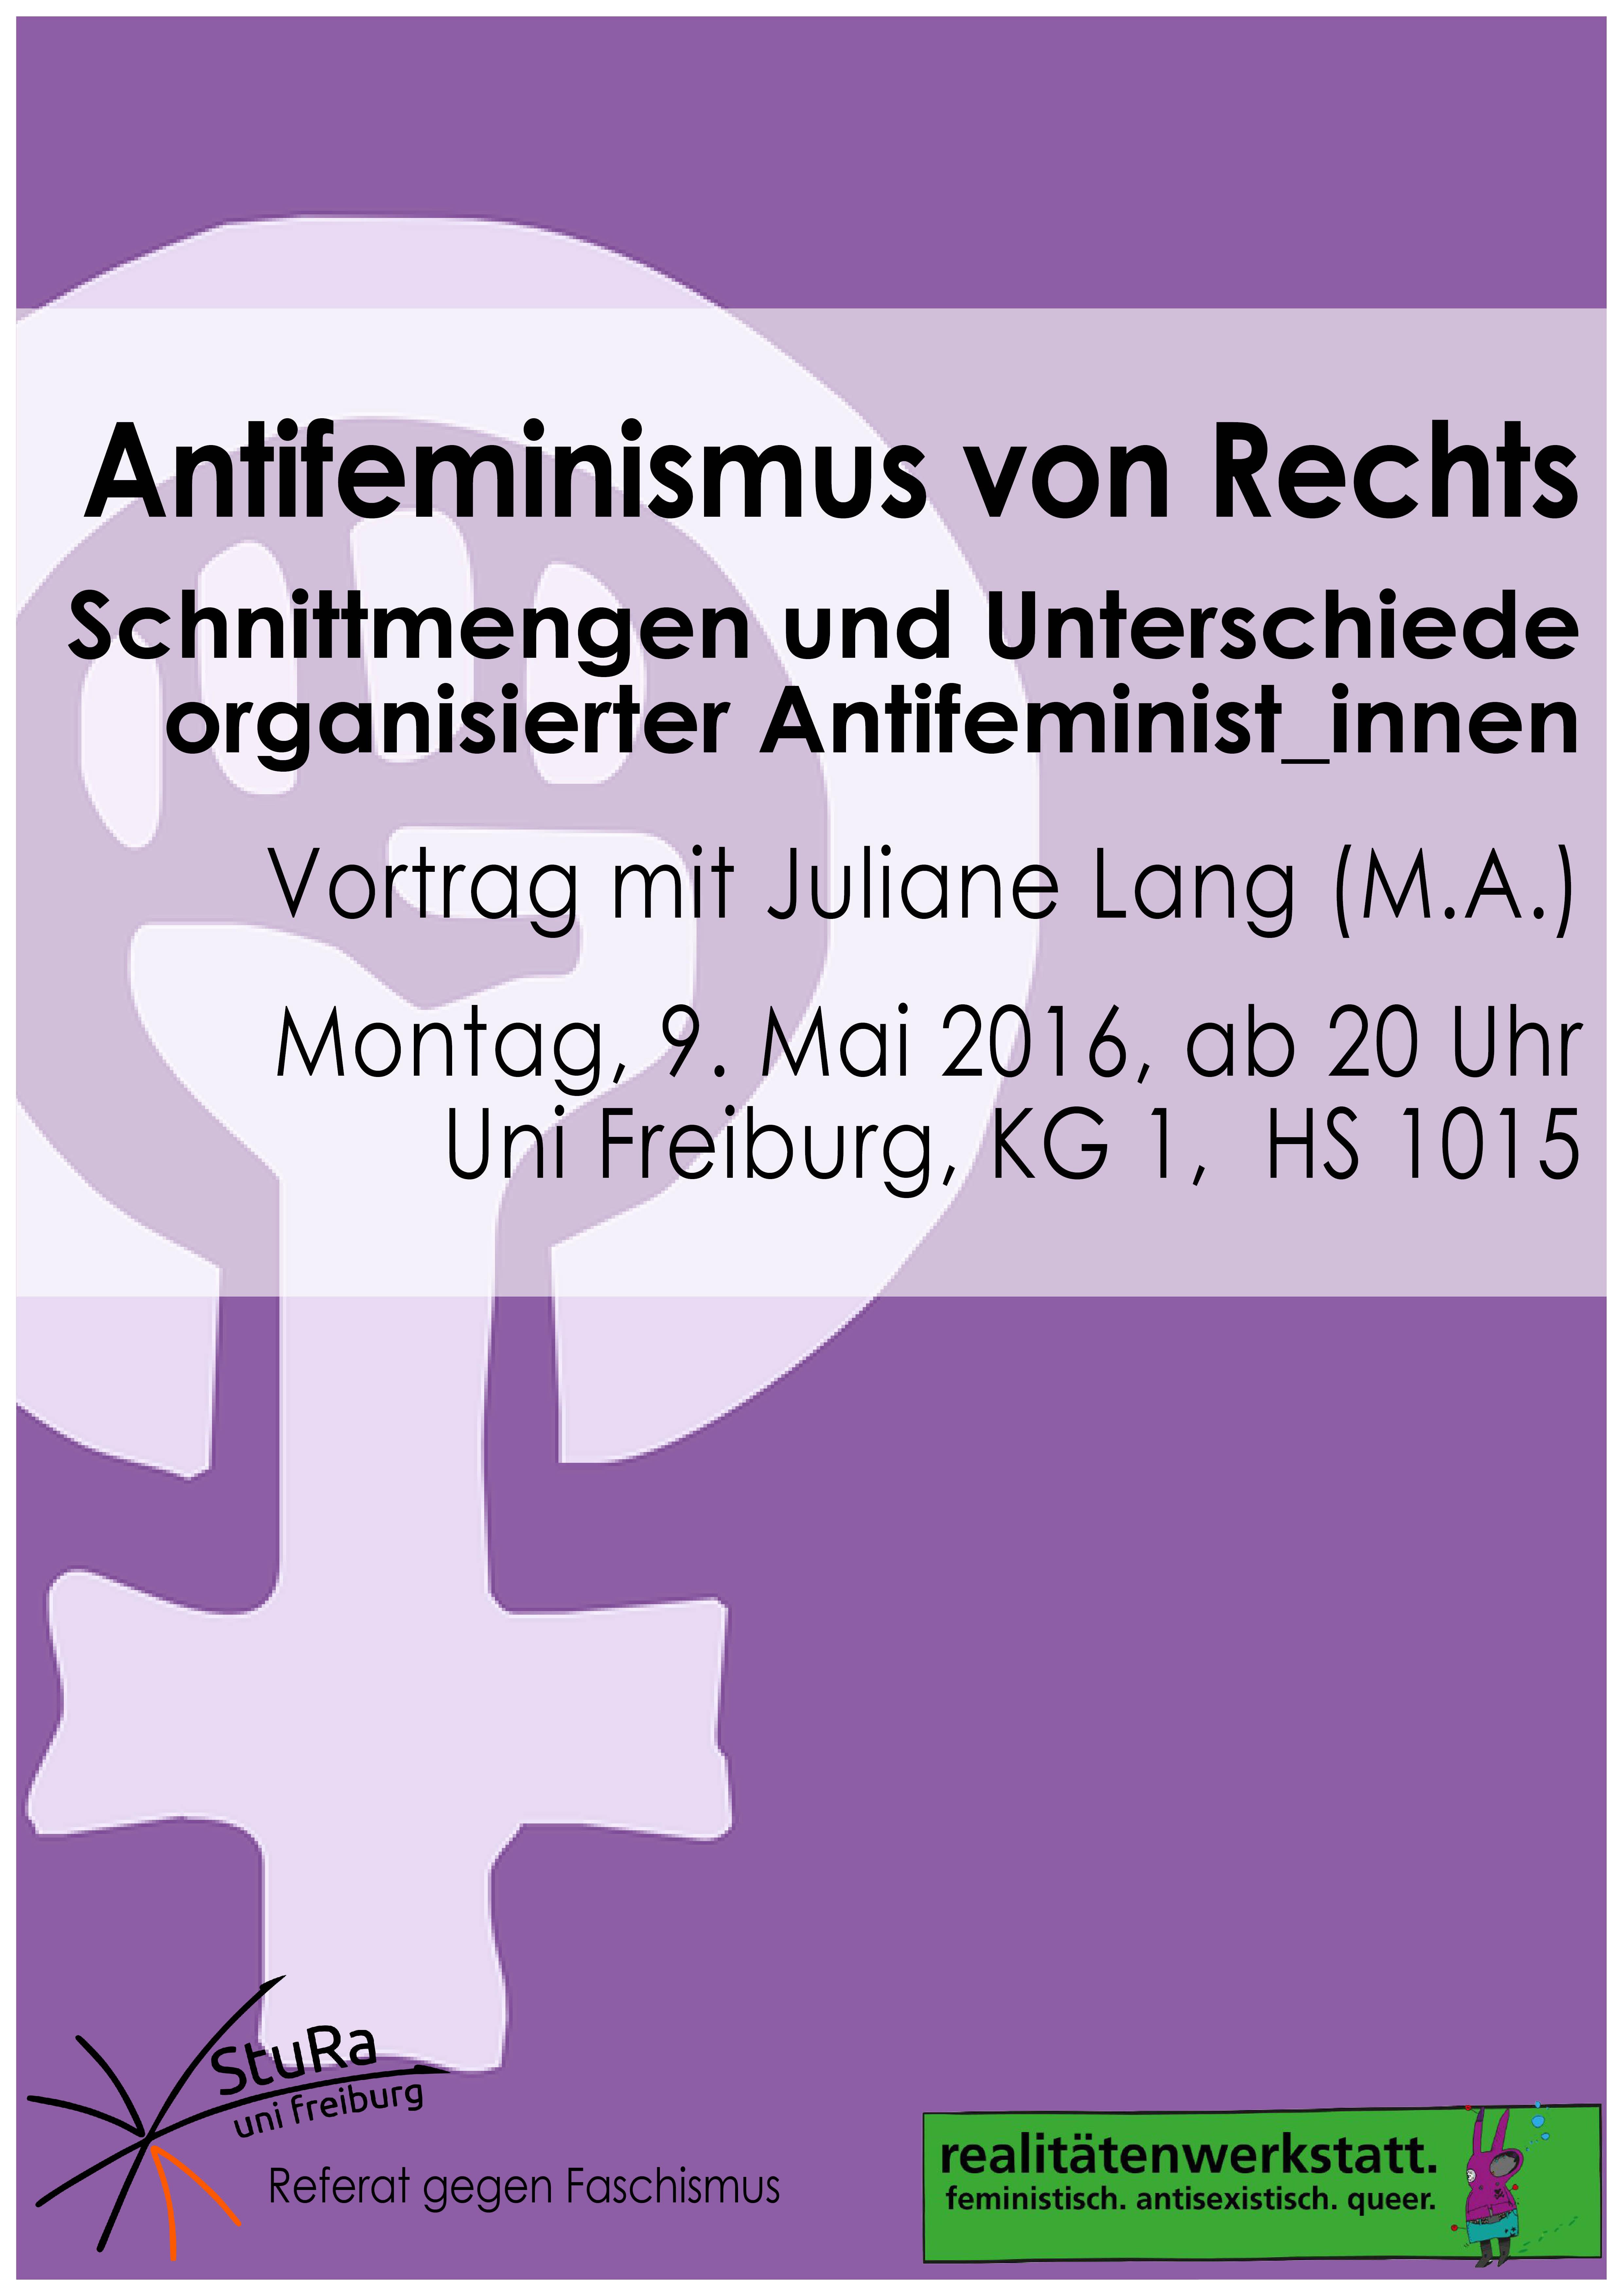 https://www.stura.uni-freiburg.de/gremien/referate/antifa/antifeminismus/image